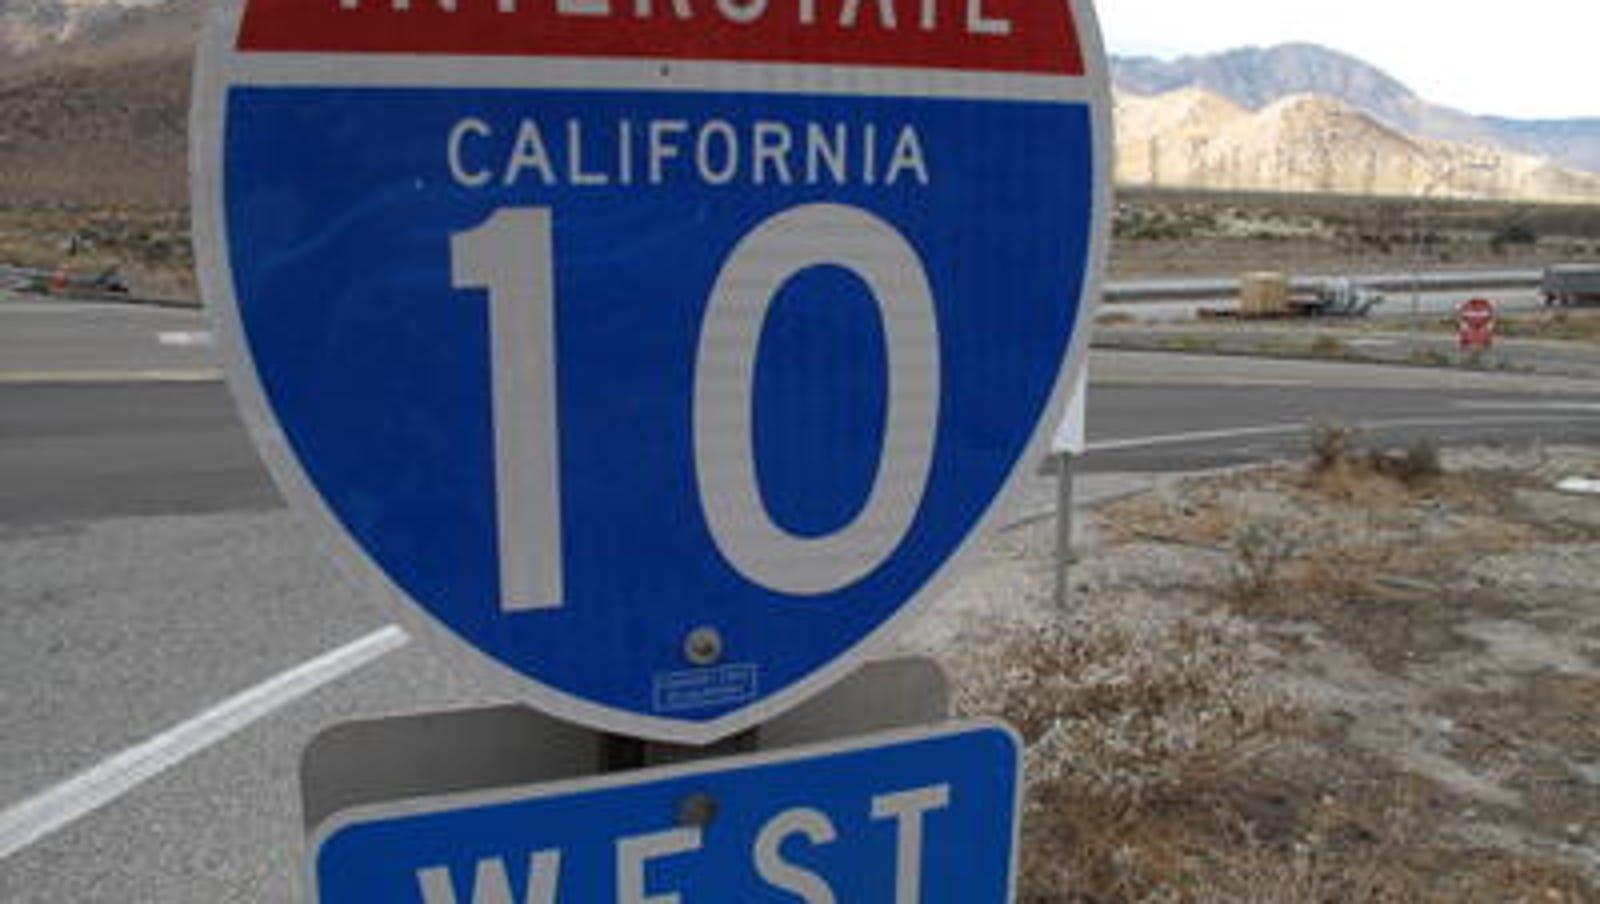 Pedestrian killed in overnight hit-and-run crash on Interstate 10 near Indio